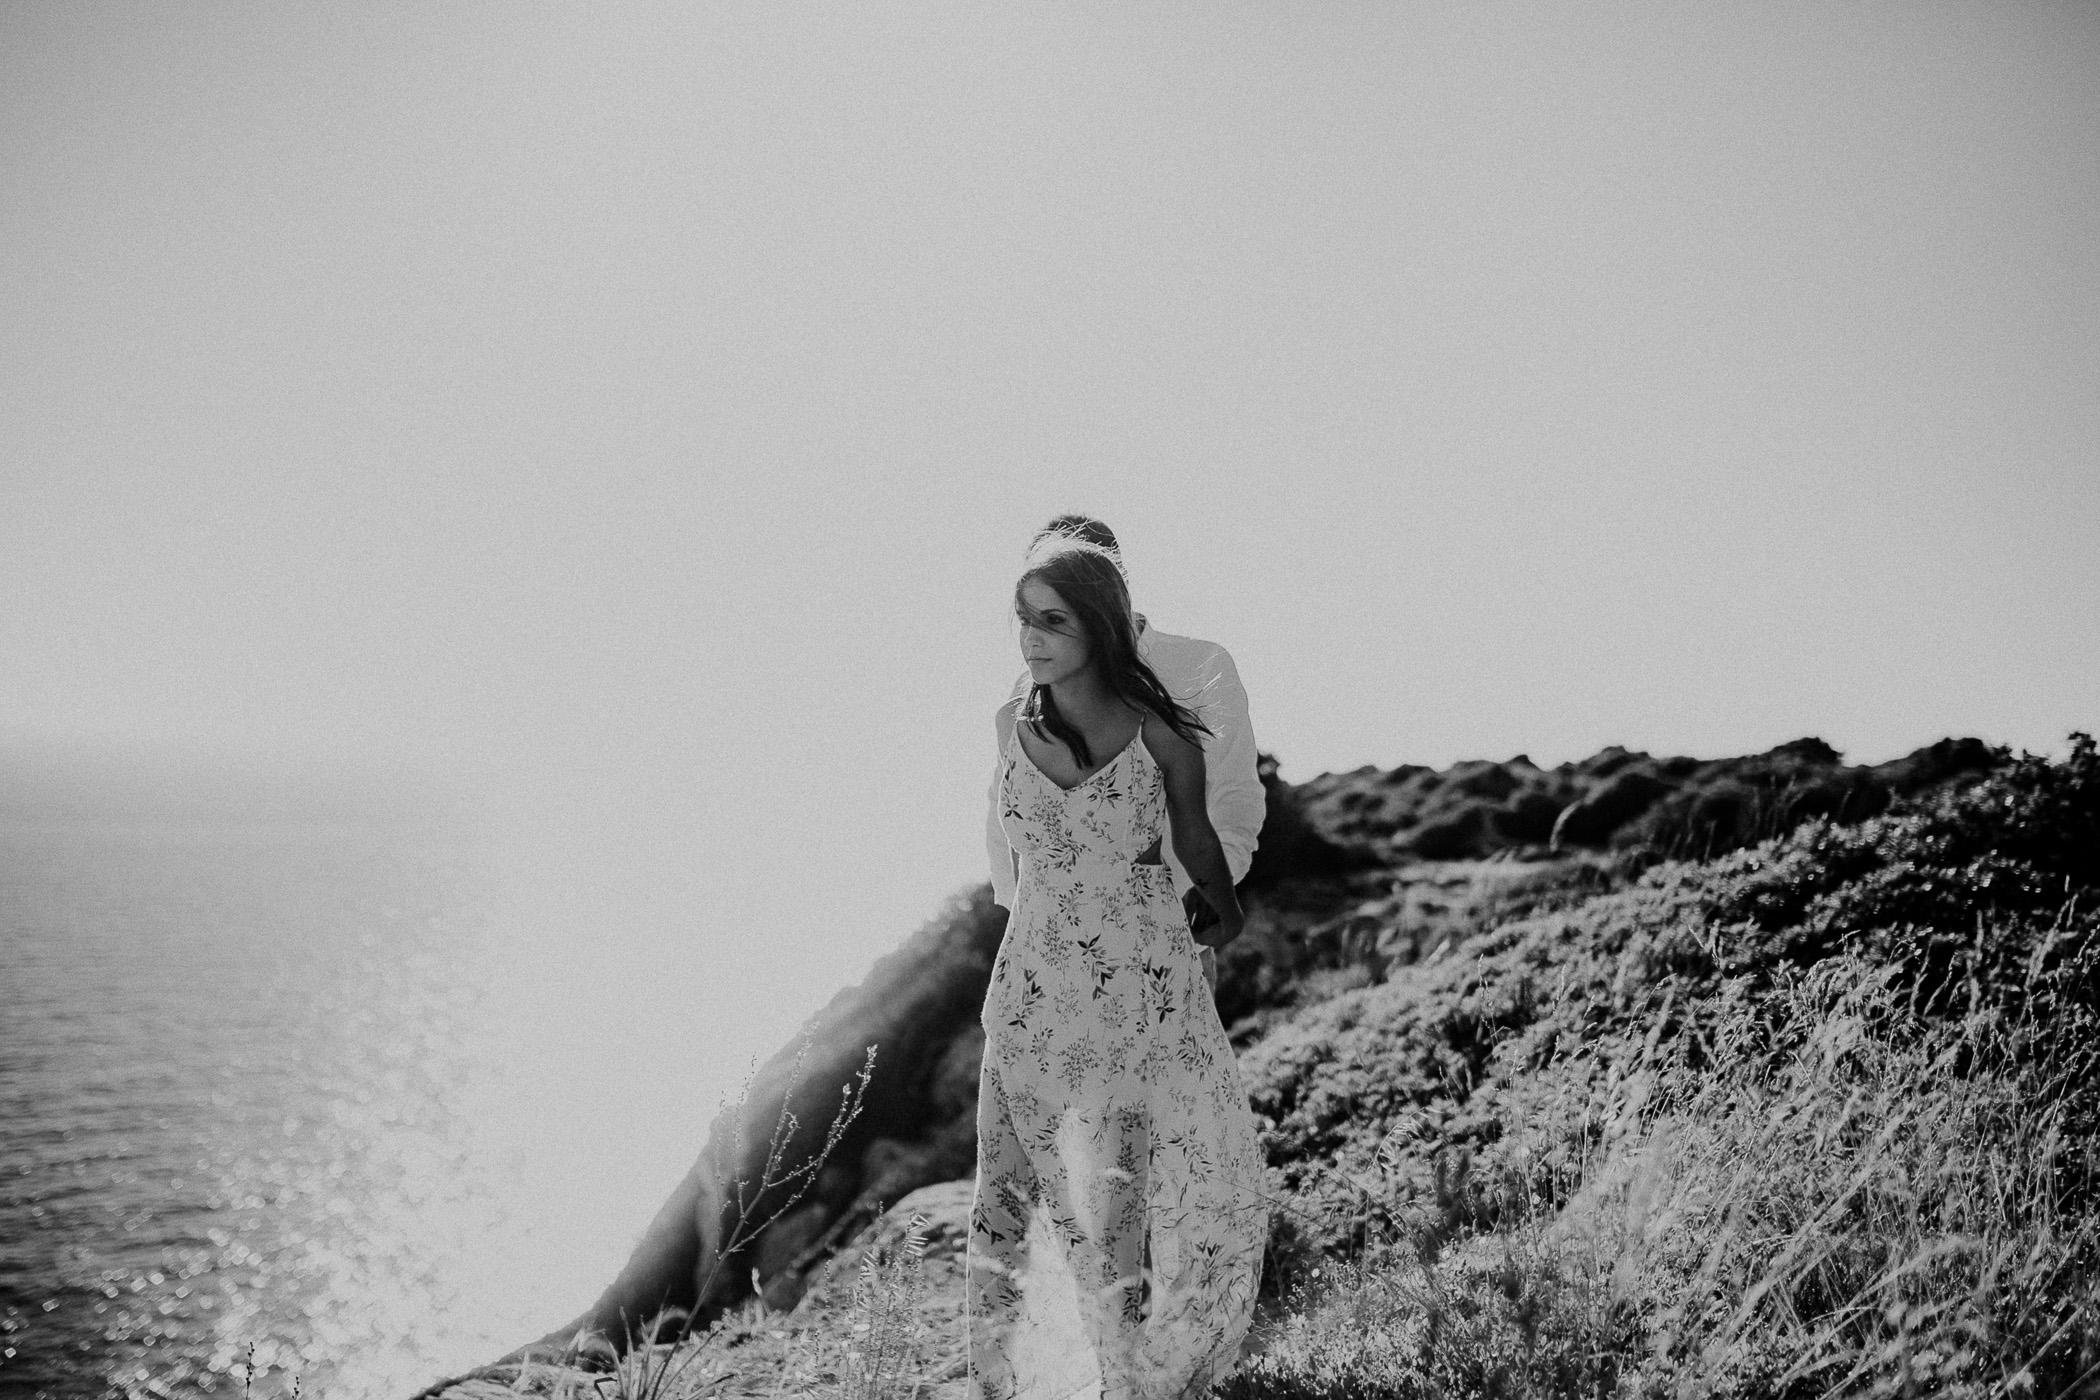 DanielaMarquardtPhotography_wedding_elopement_mallorca_spain_calapi_palma_lauraandtoni_288